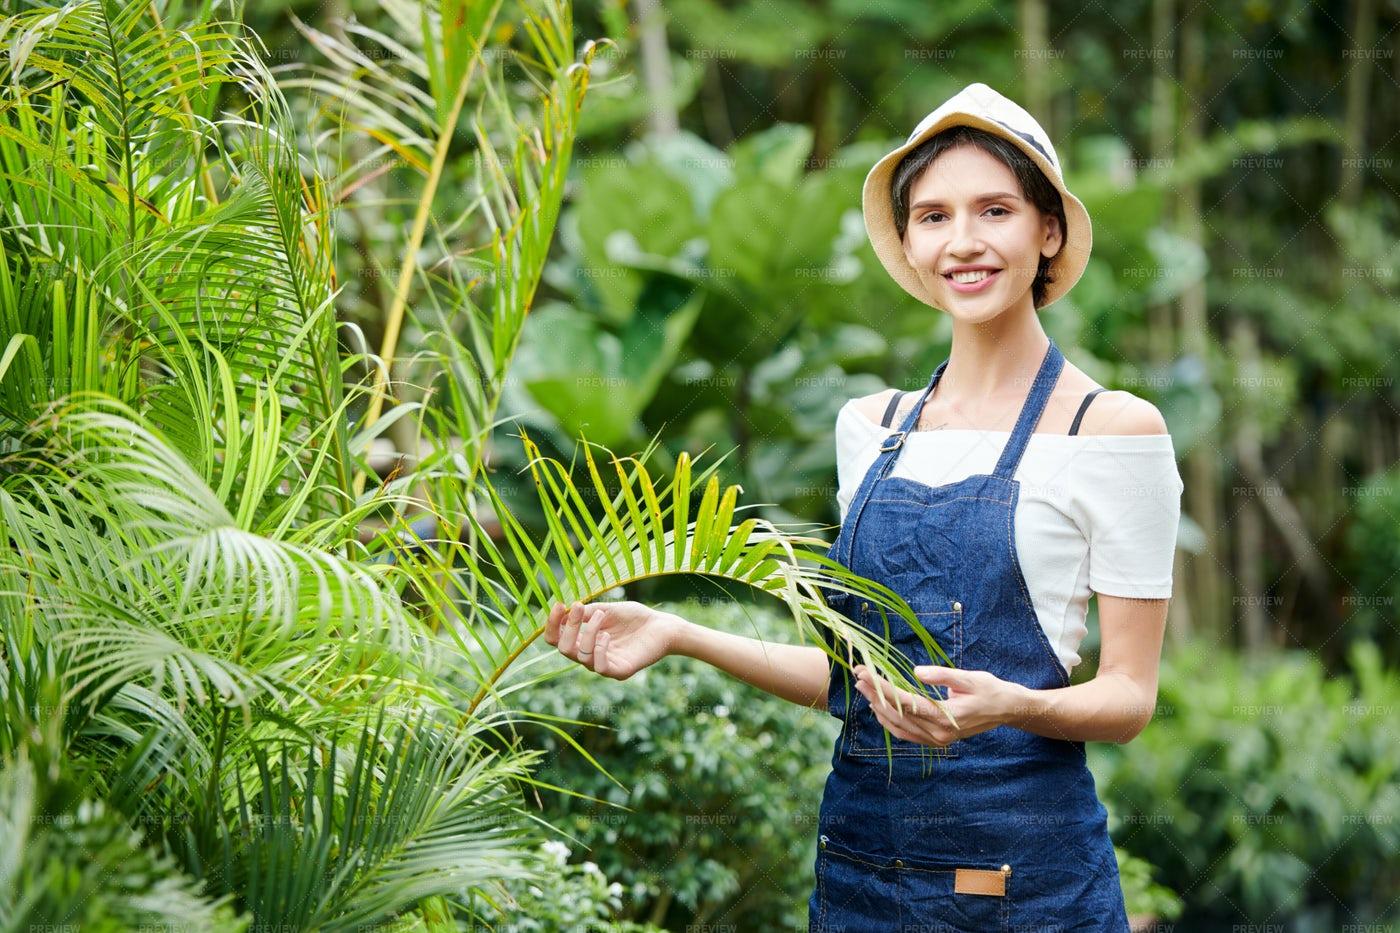 Woman Working In Tropical Garden: Stock Photos